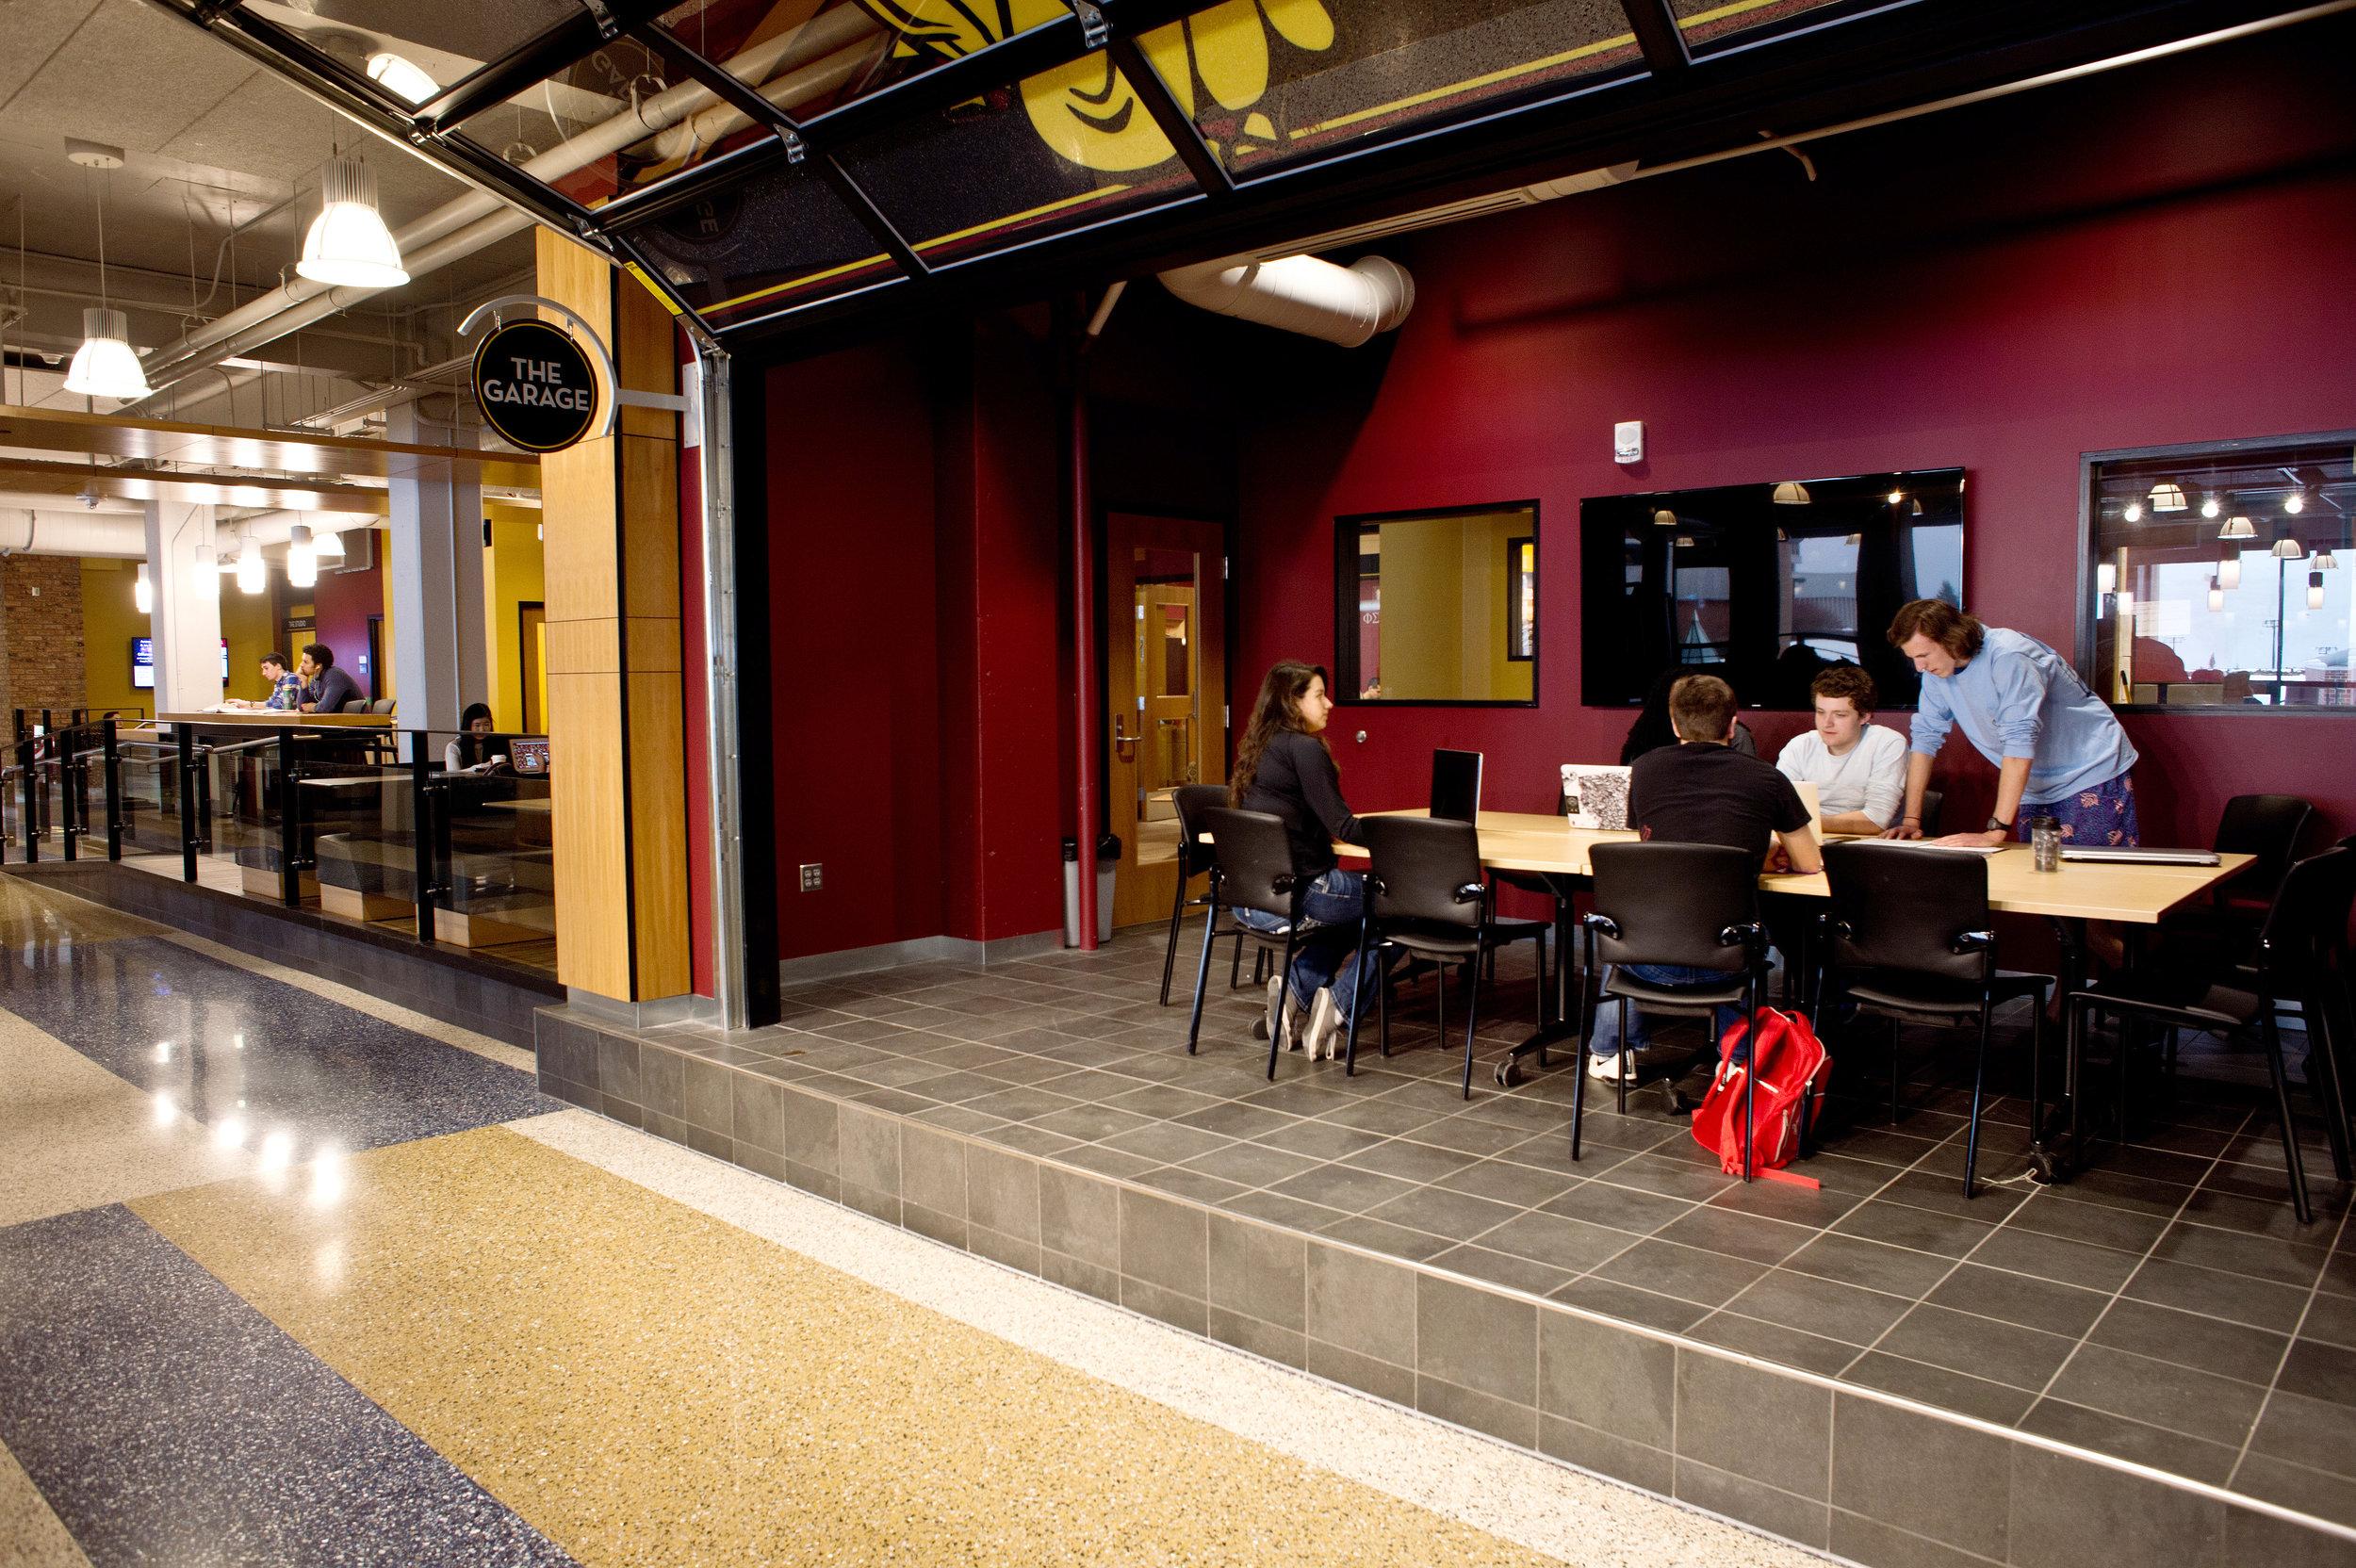 Kirby Student Center Wins ACUI Facility Design Award